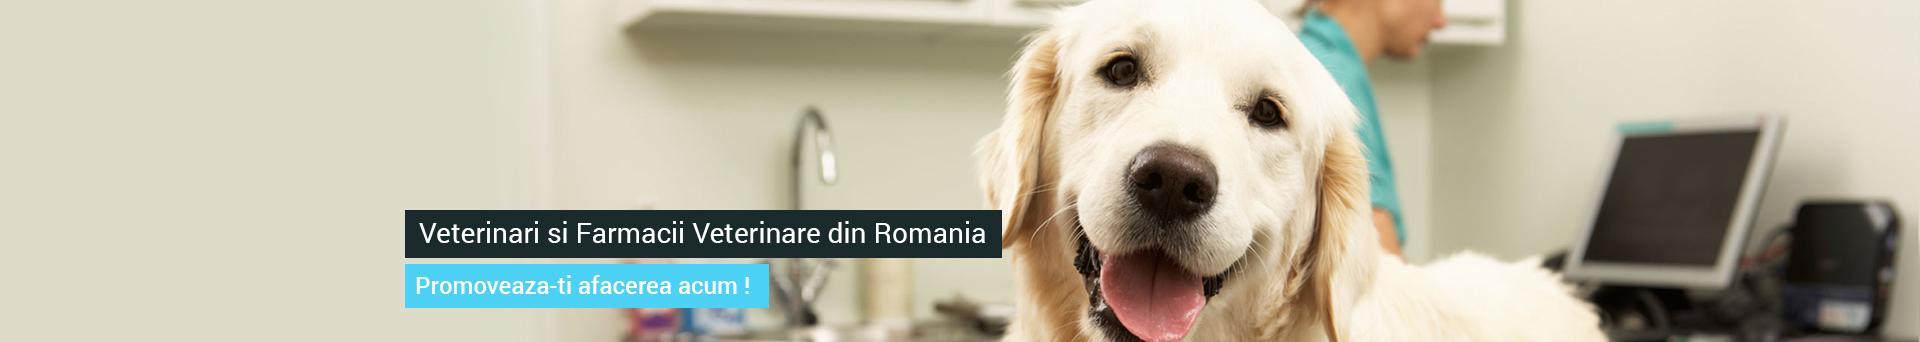 Farmacie veterinara Bucuresti